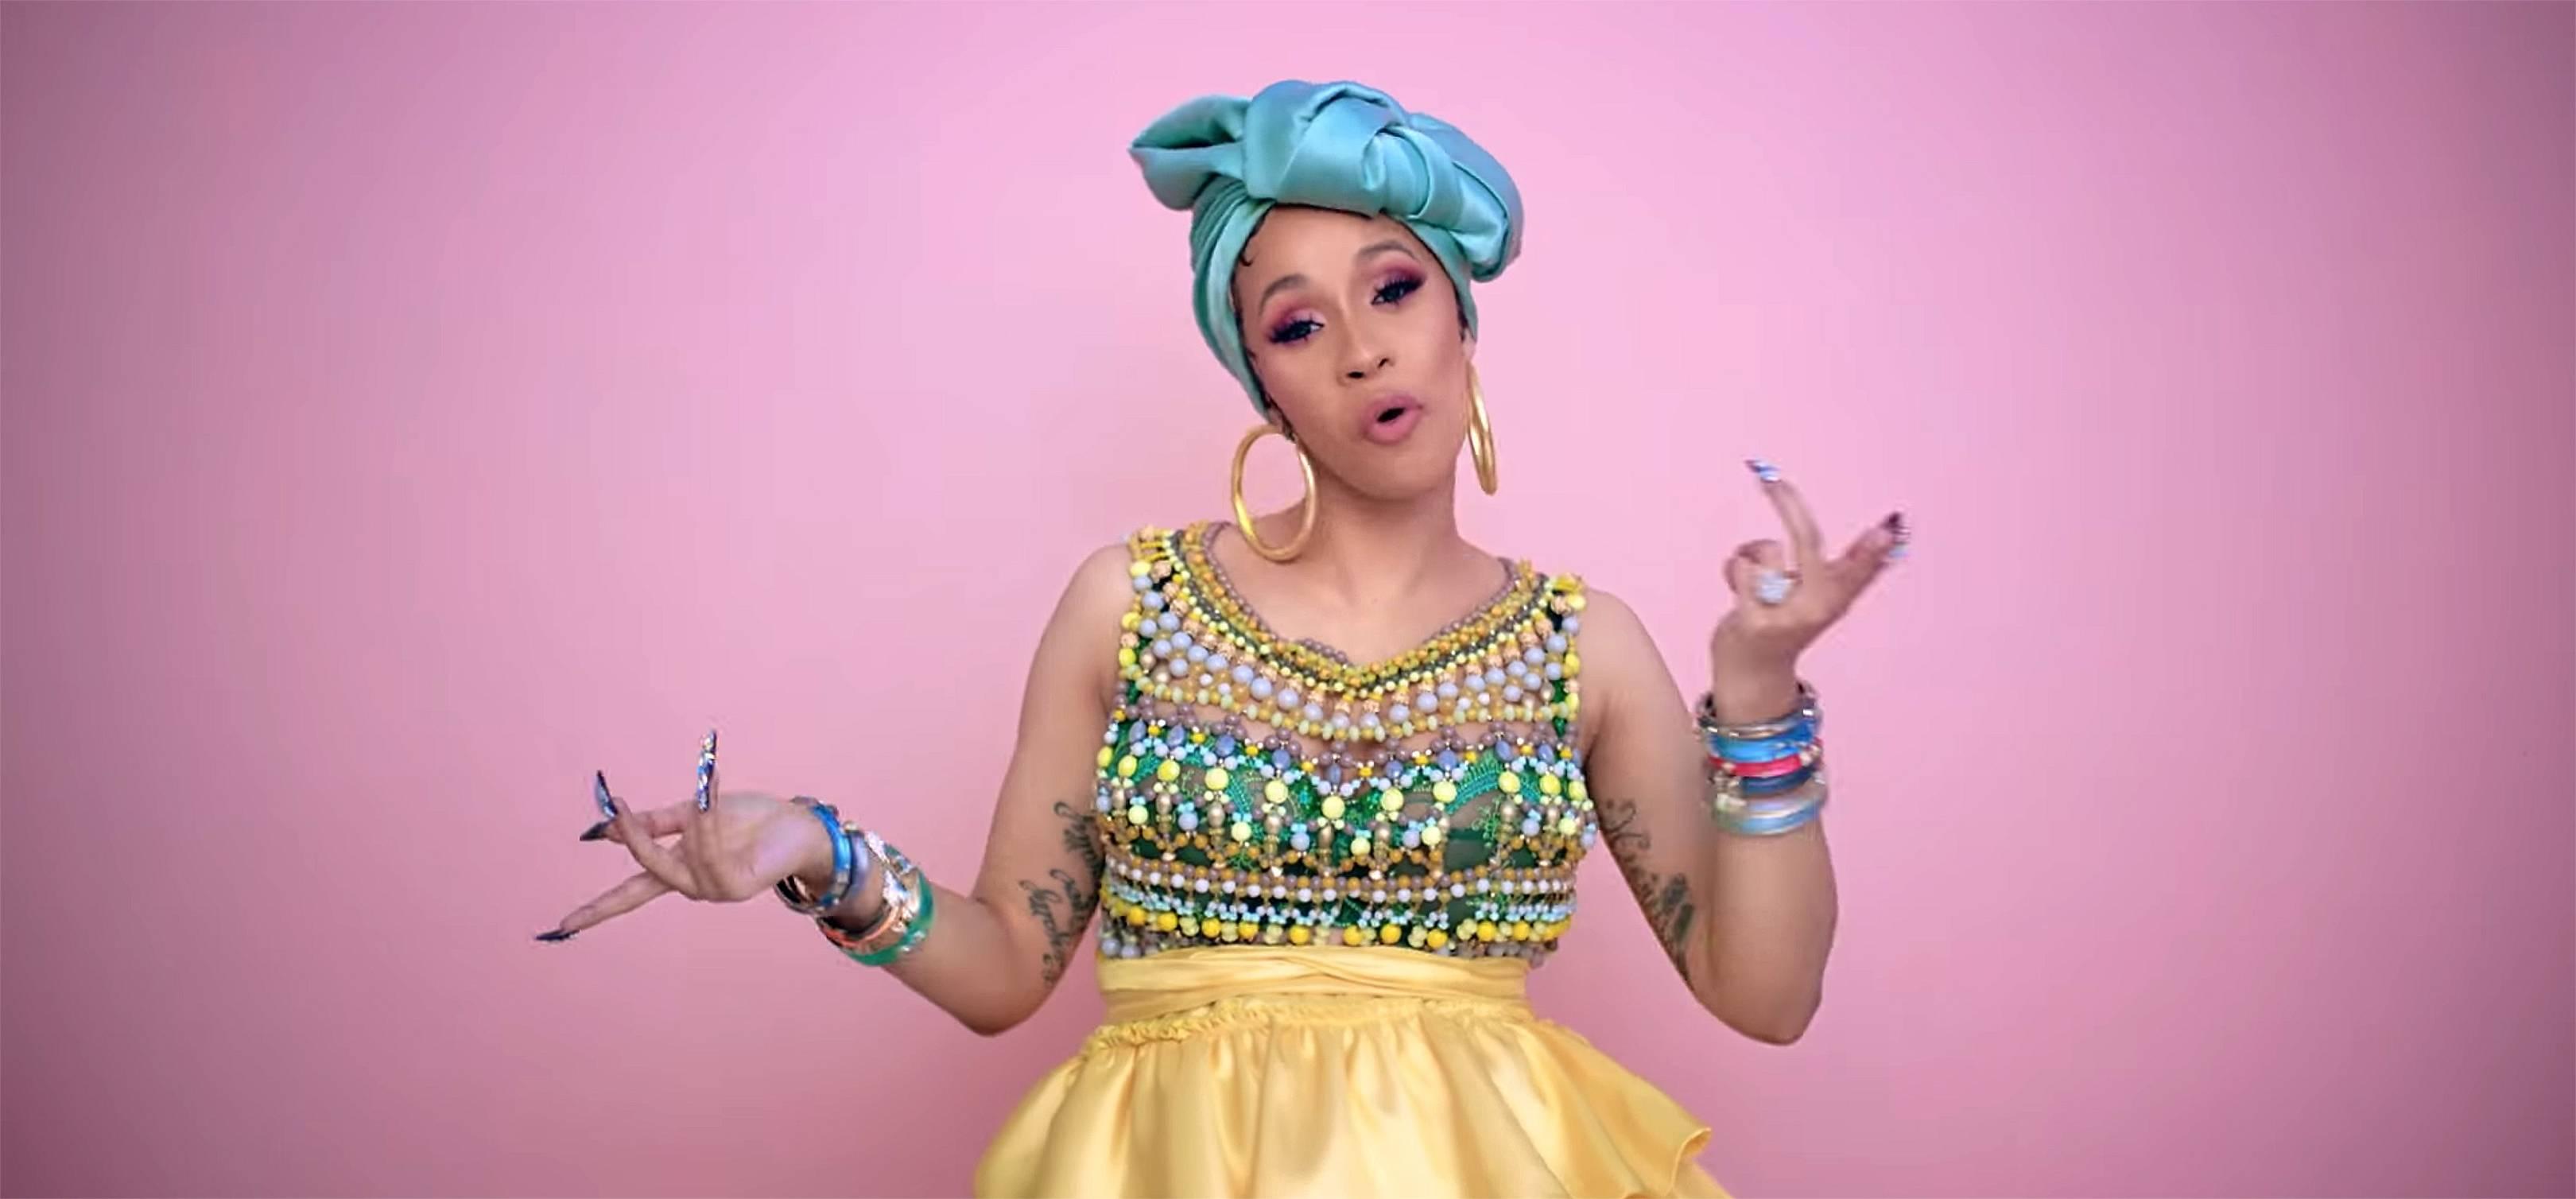 Cardi B Music Video For 'I Like It' | Glamour UK